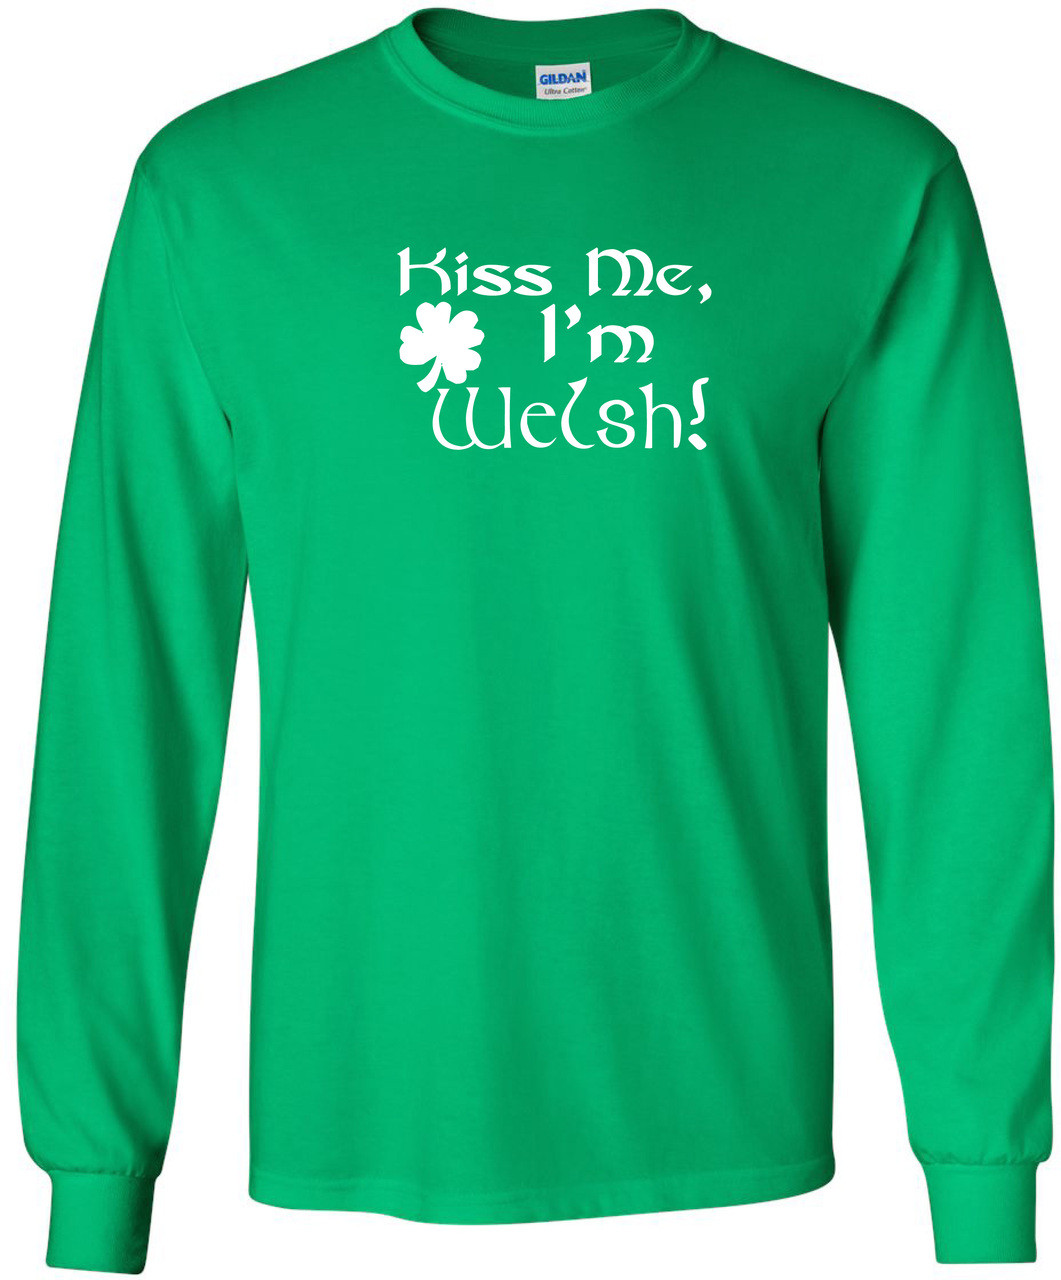 Kiss Me Im Irish Sweatshirt Funny Humor